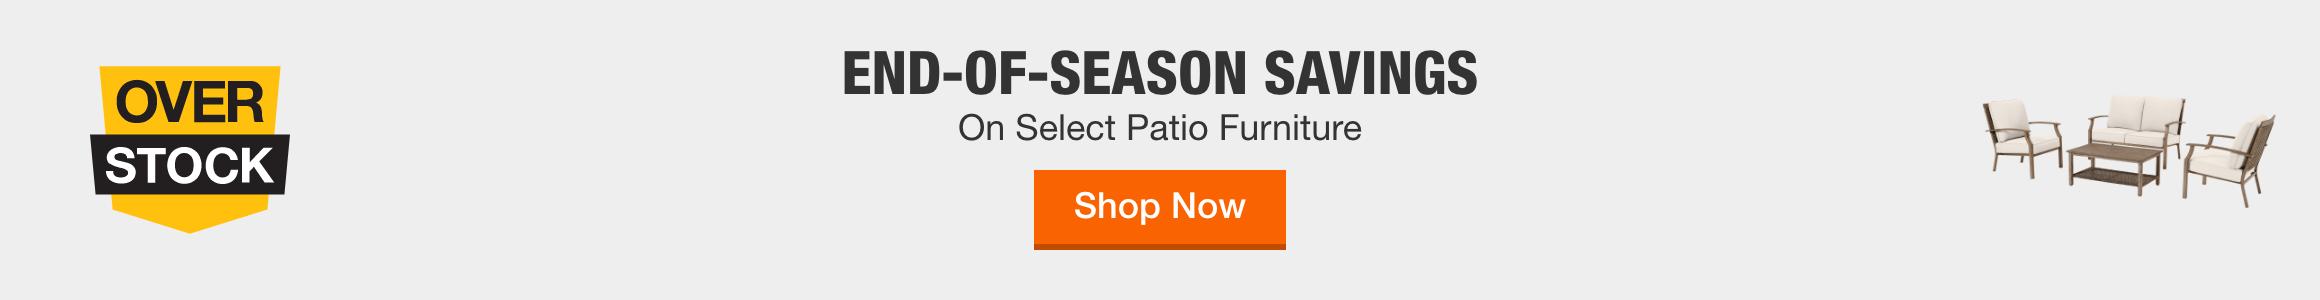 END-OF-SEASON SAVINGS On Select Patio Furniture. Shop Now